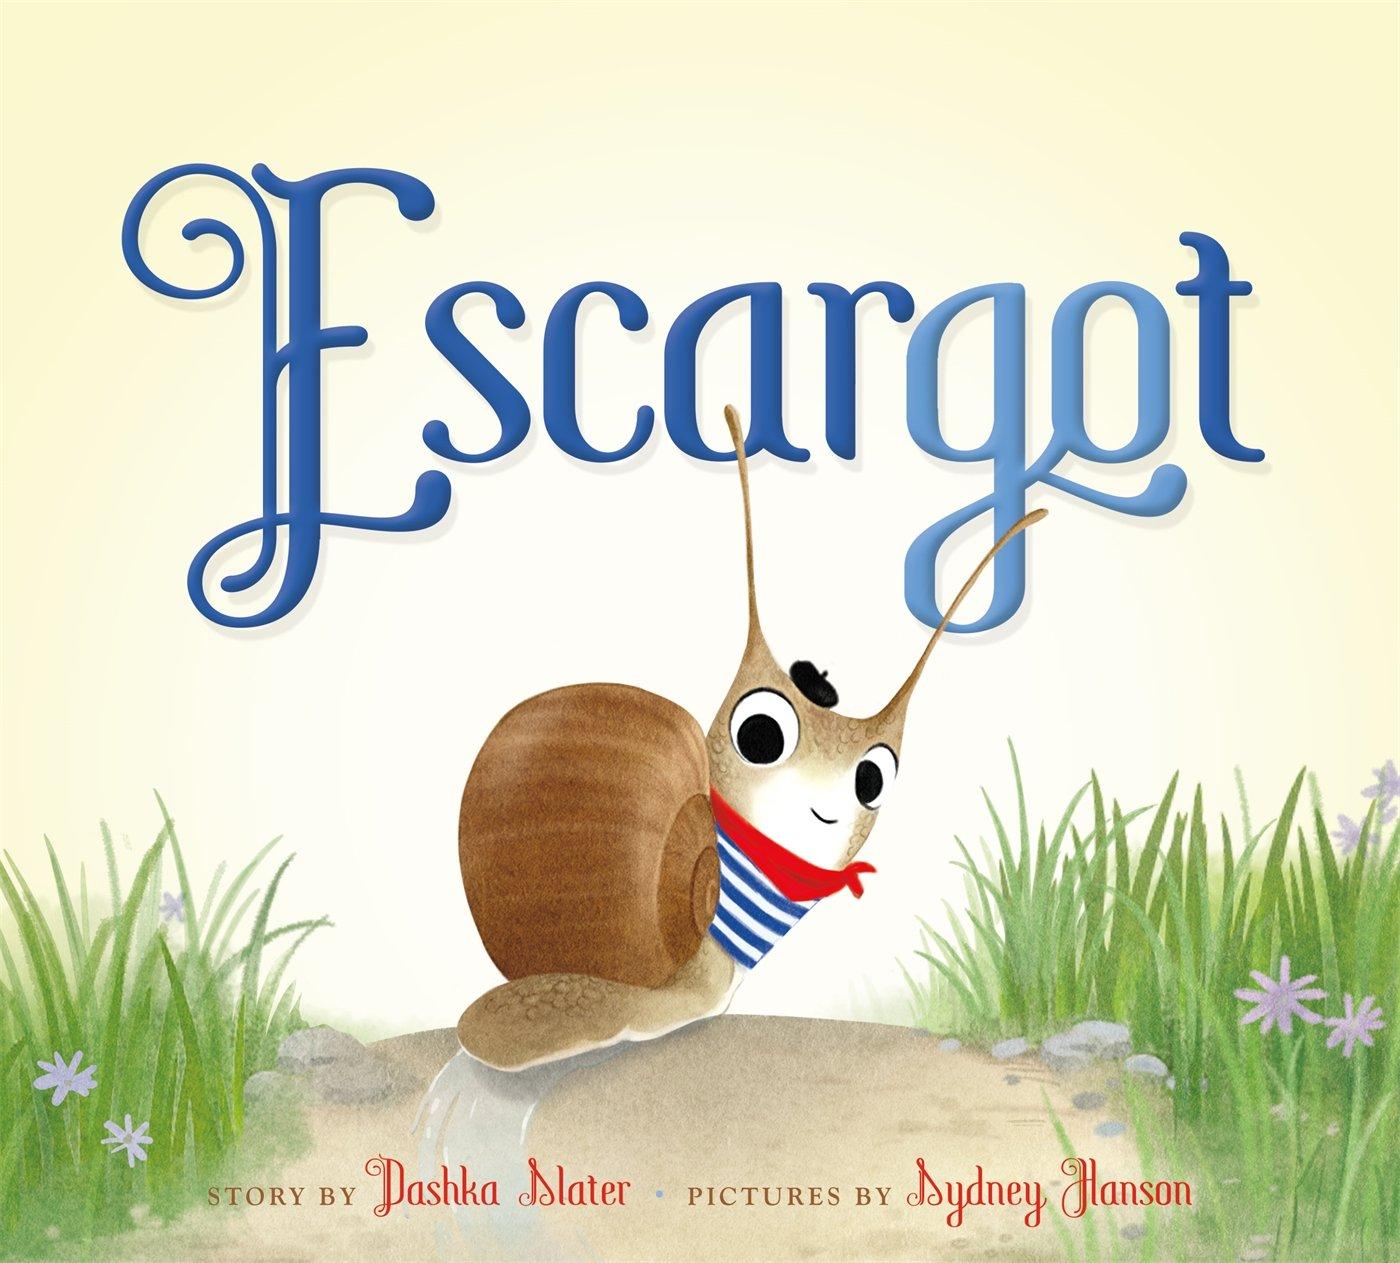 Escargot by Dashka Slater and Sydney Hanson